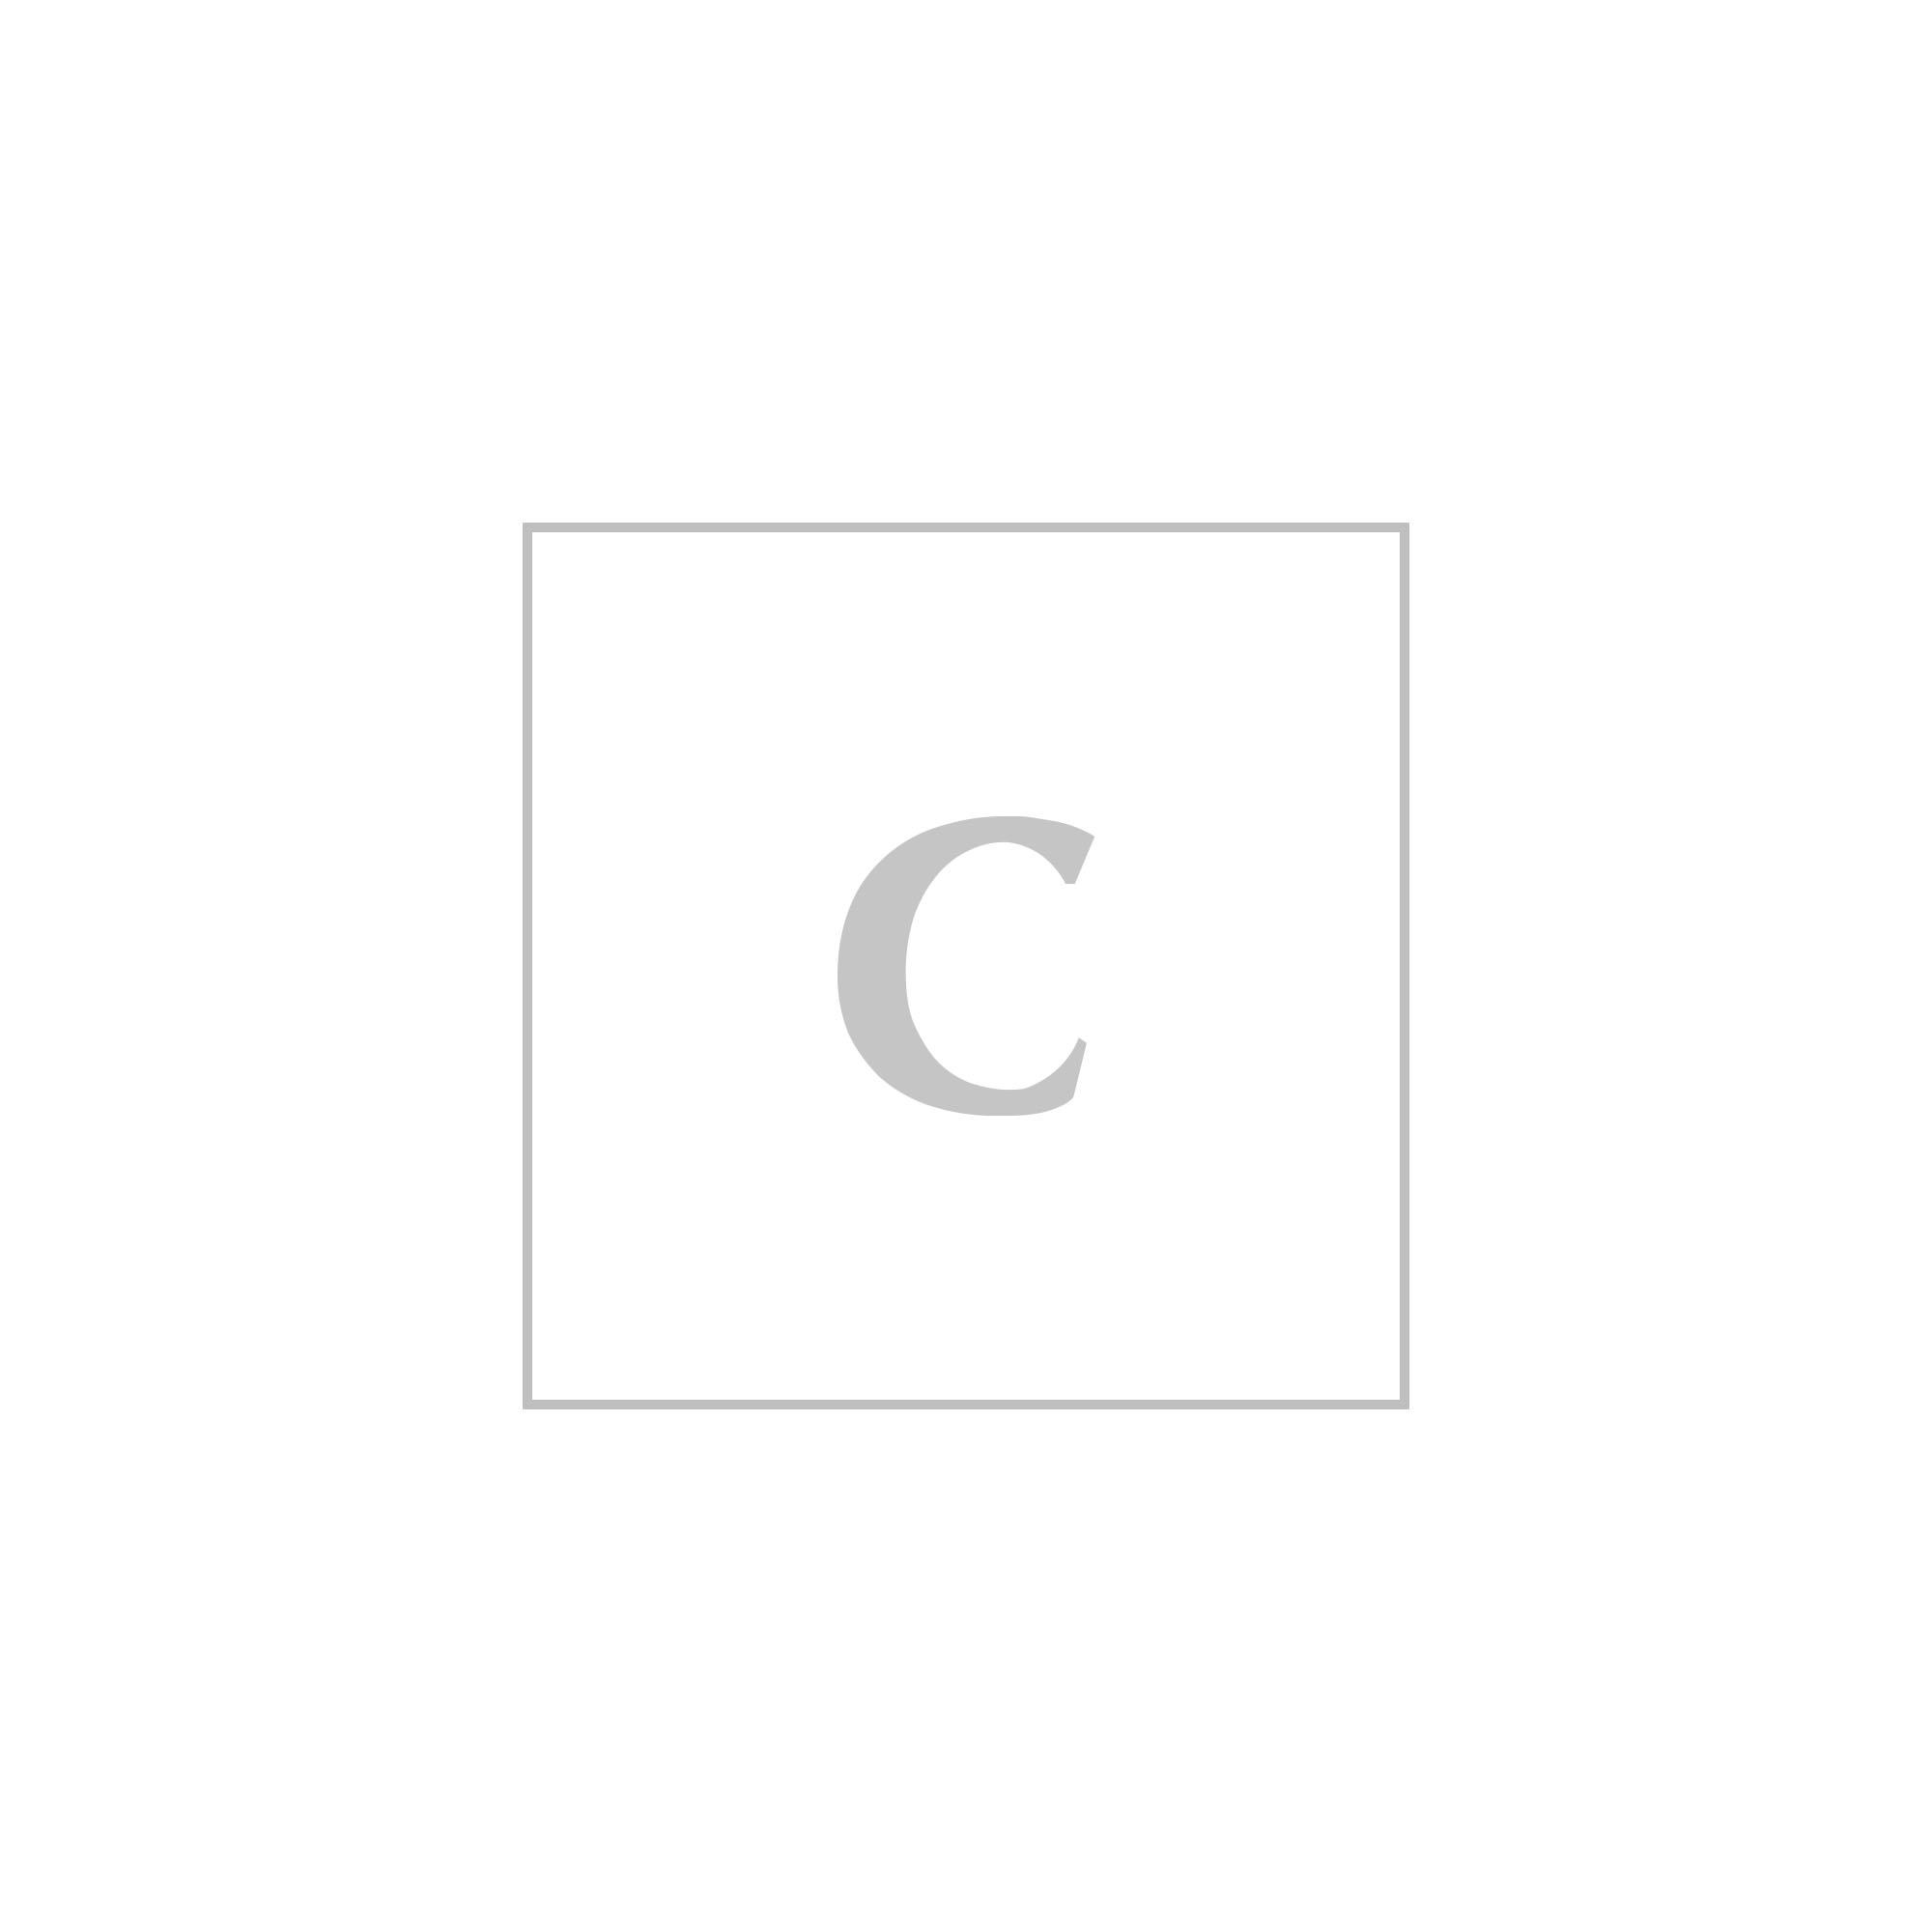 Saint laurent ysl monogram